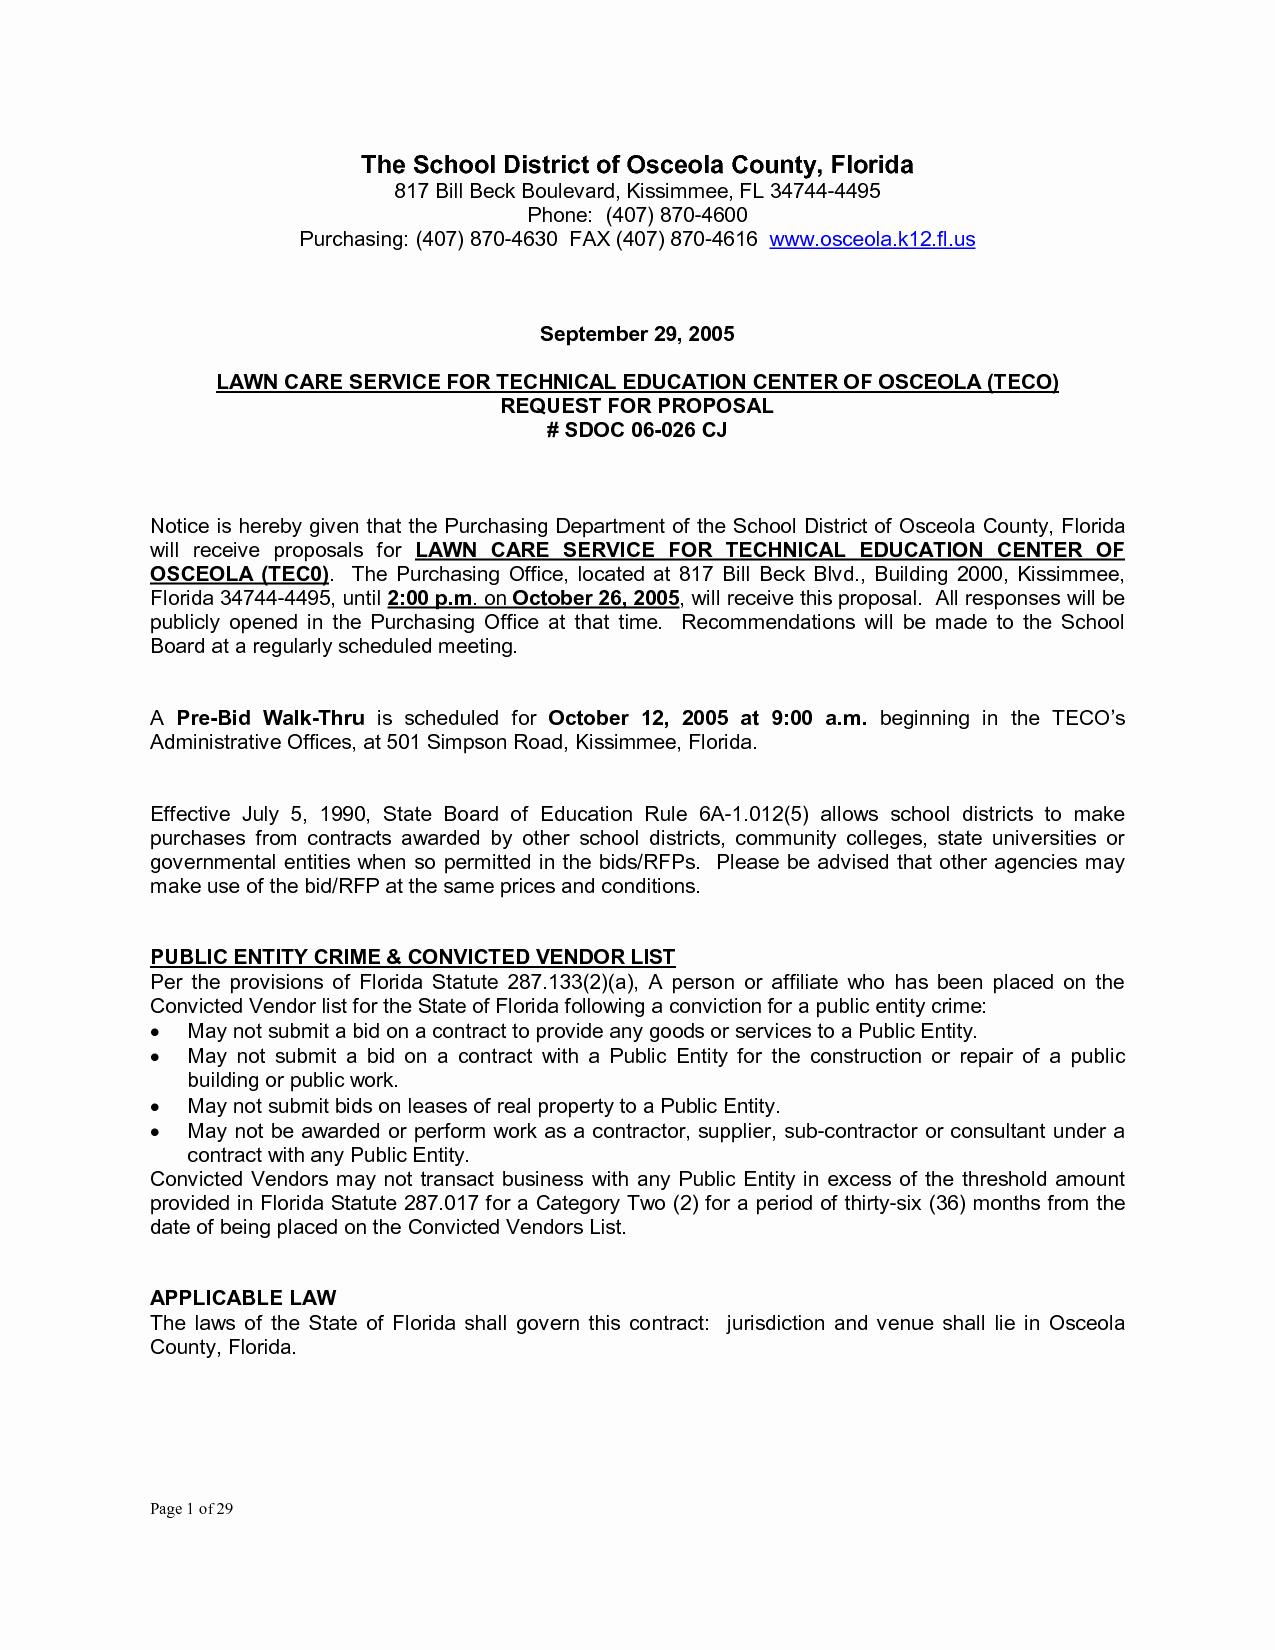 Lawn Care Proposal Template Inspirational Bid Proposal Letter Mughals